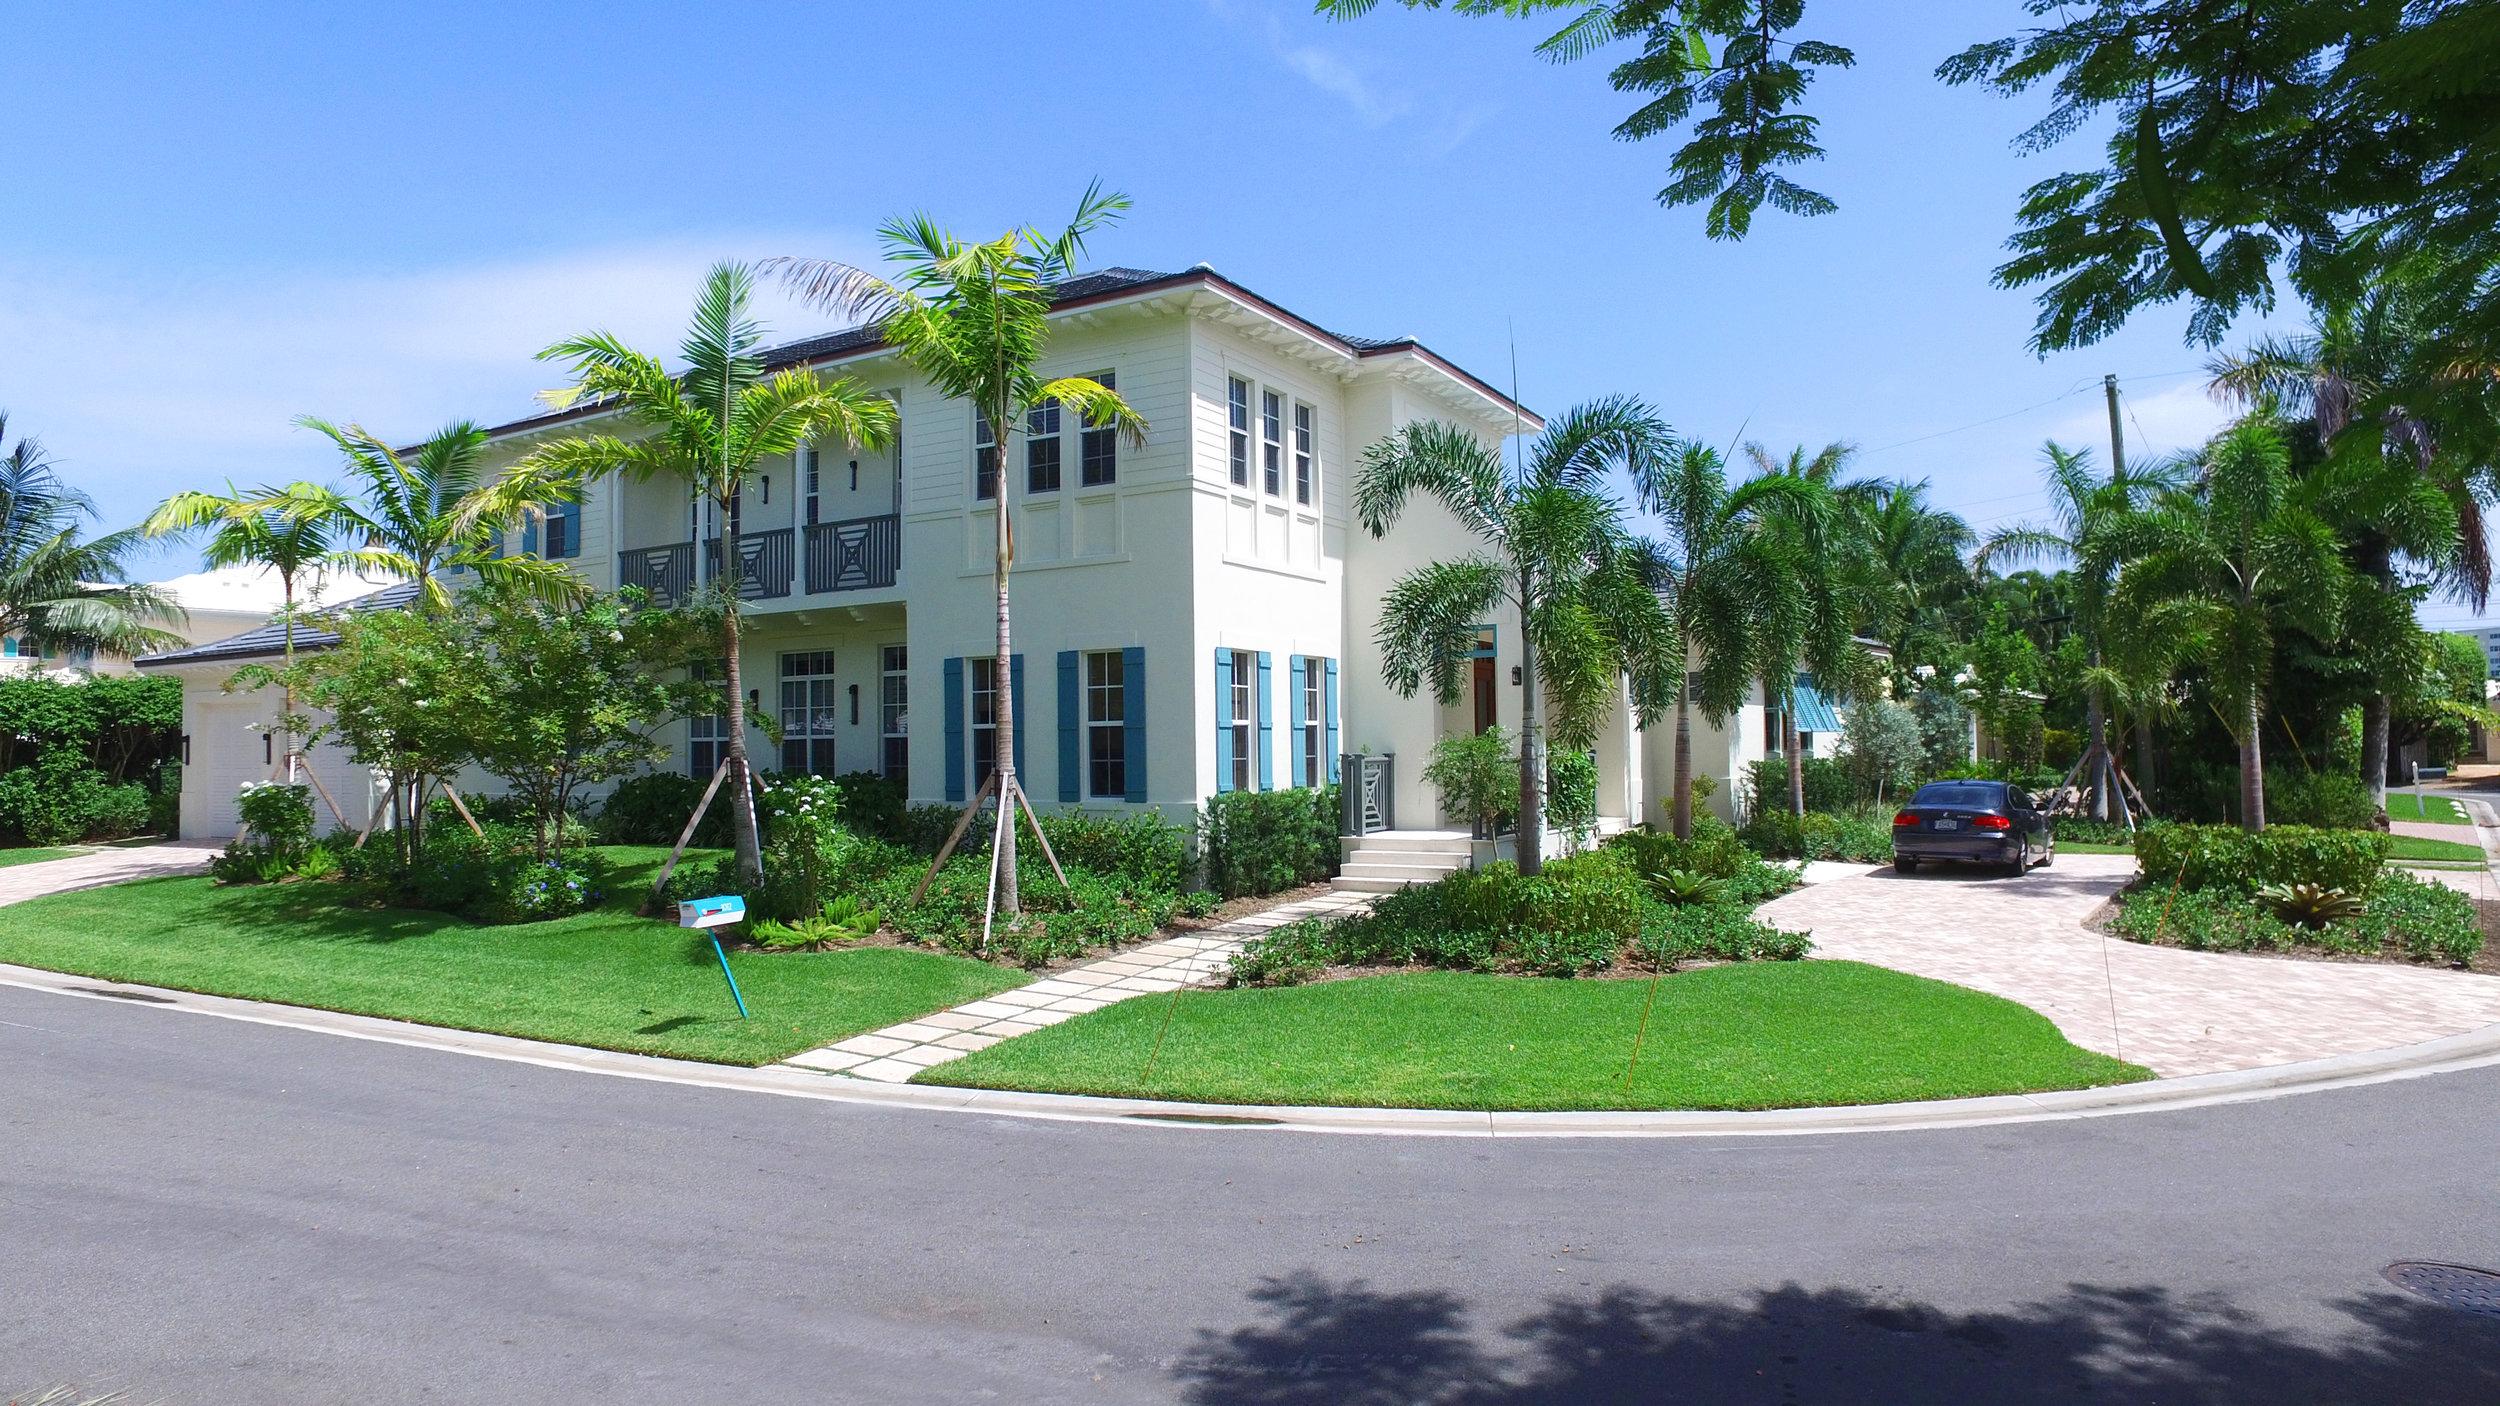 Custom Home | Delray Beach, FL  4 Beds |4.5 Baths | 5,200 SF  Architect | Gary Eliopolis   View Project